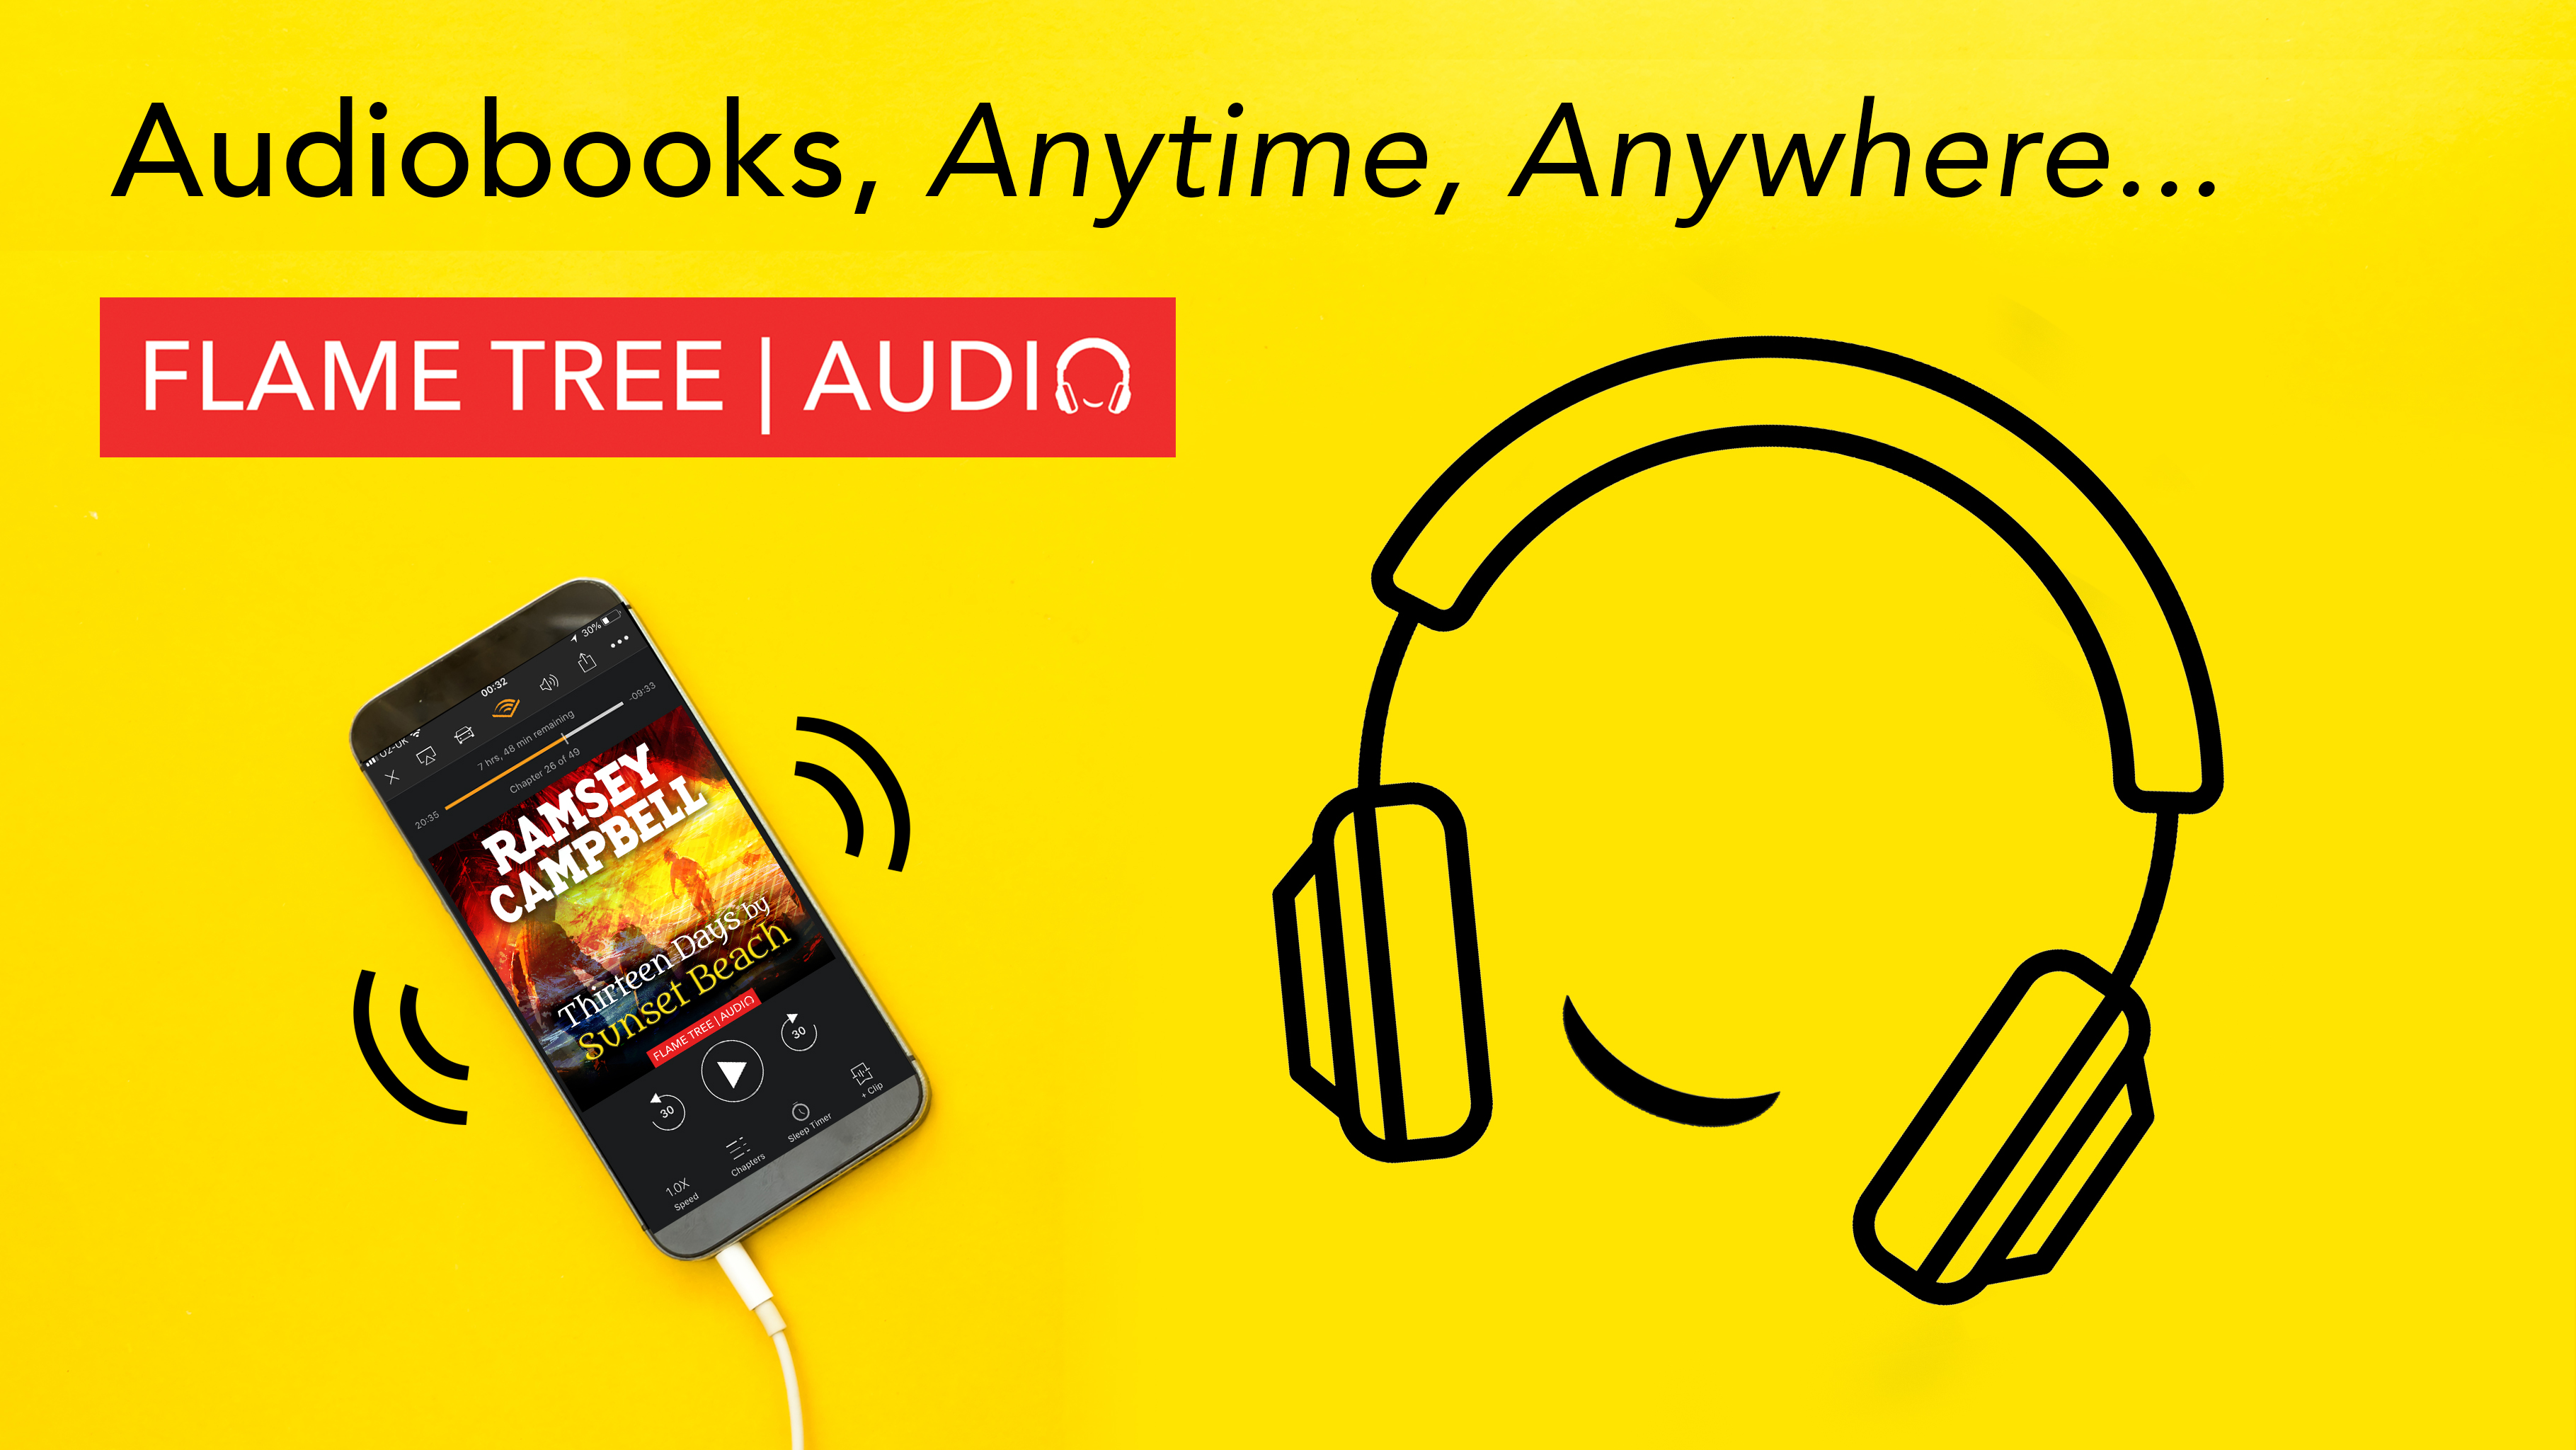 Flame Tree Audiobooks, anytime, anywhere, Thirteen Days by Sunset Beach